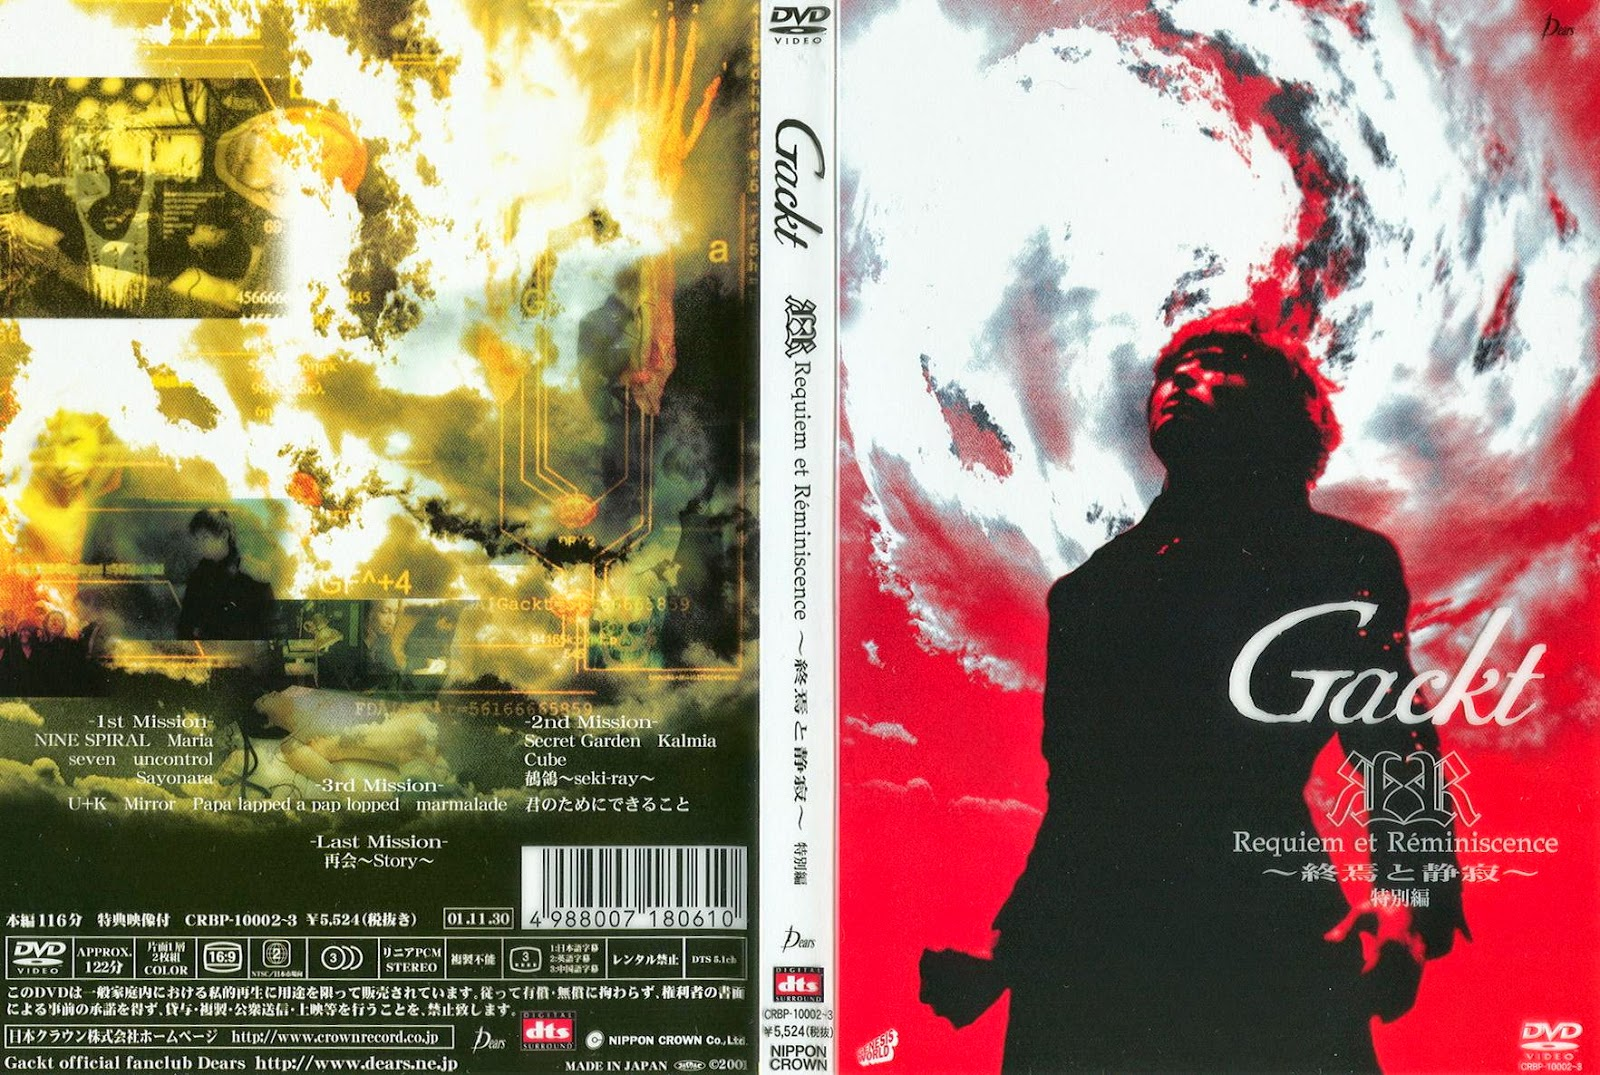 Descargar DVD Requiem Et Reminiscence Shuuen To Seijaku Gackt